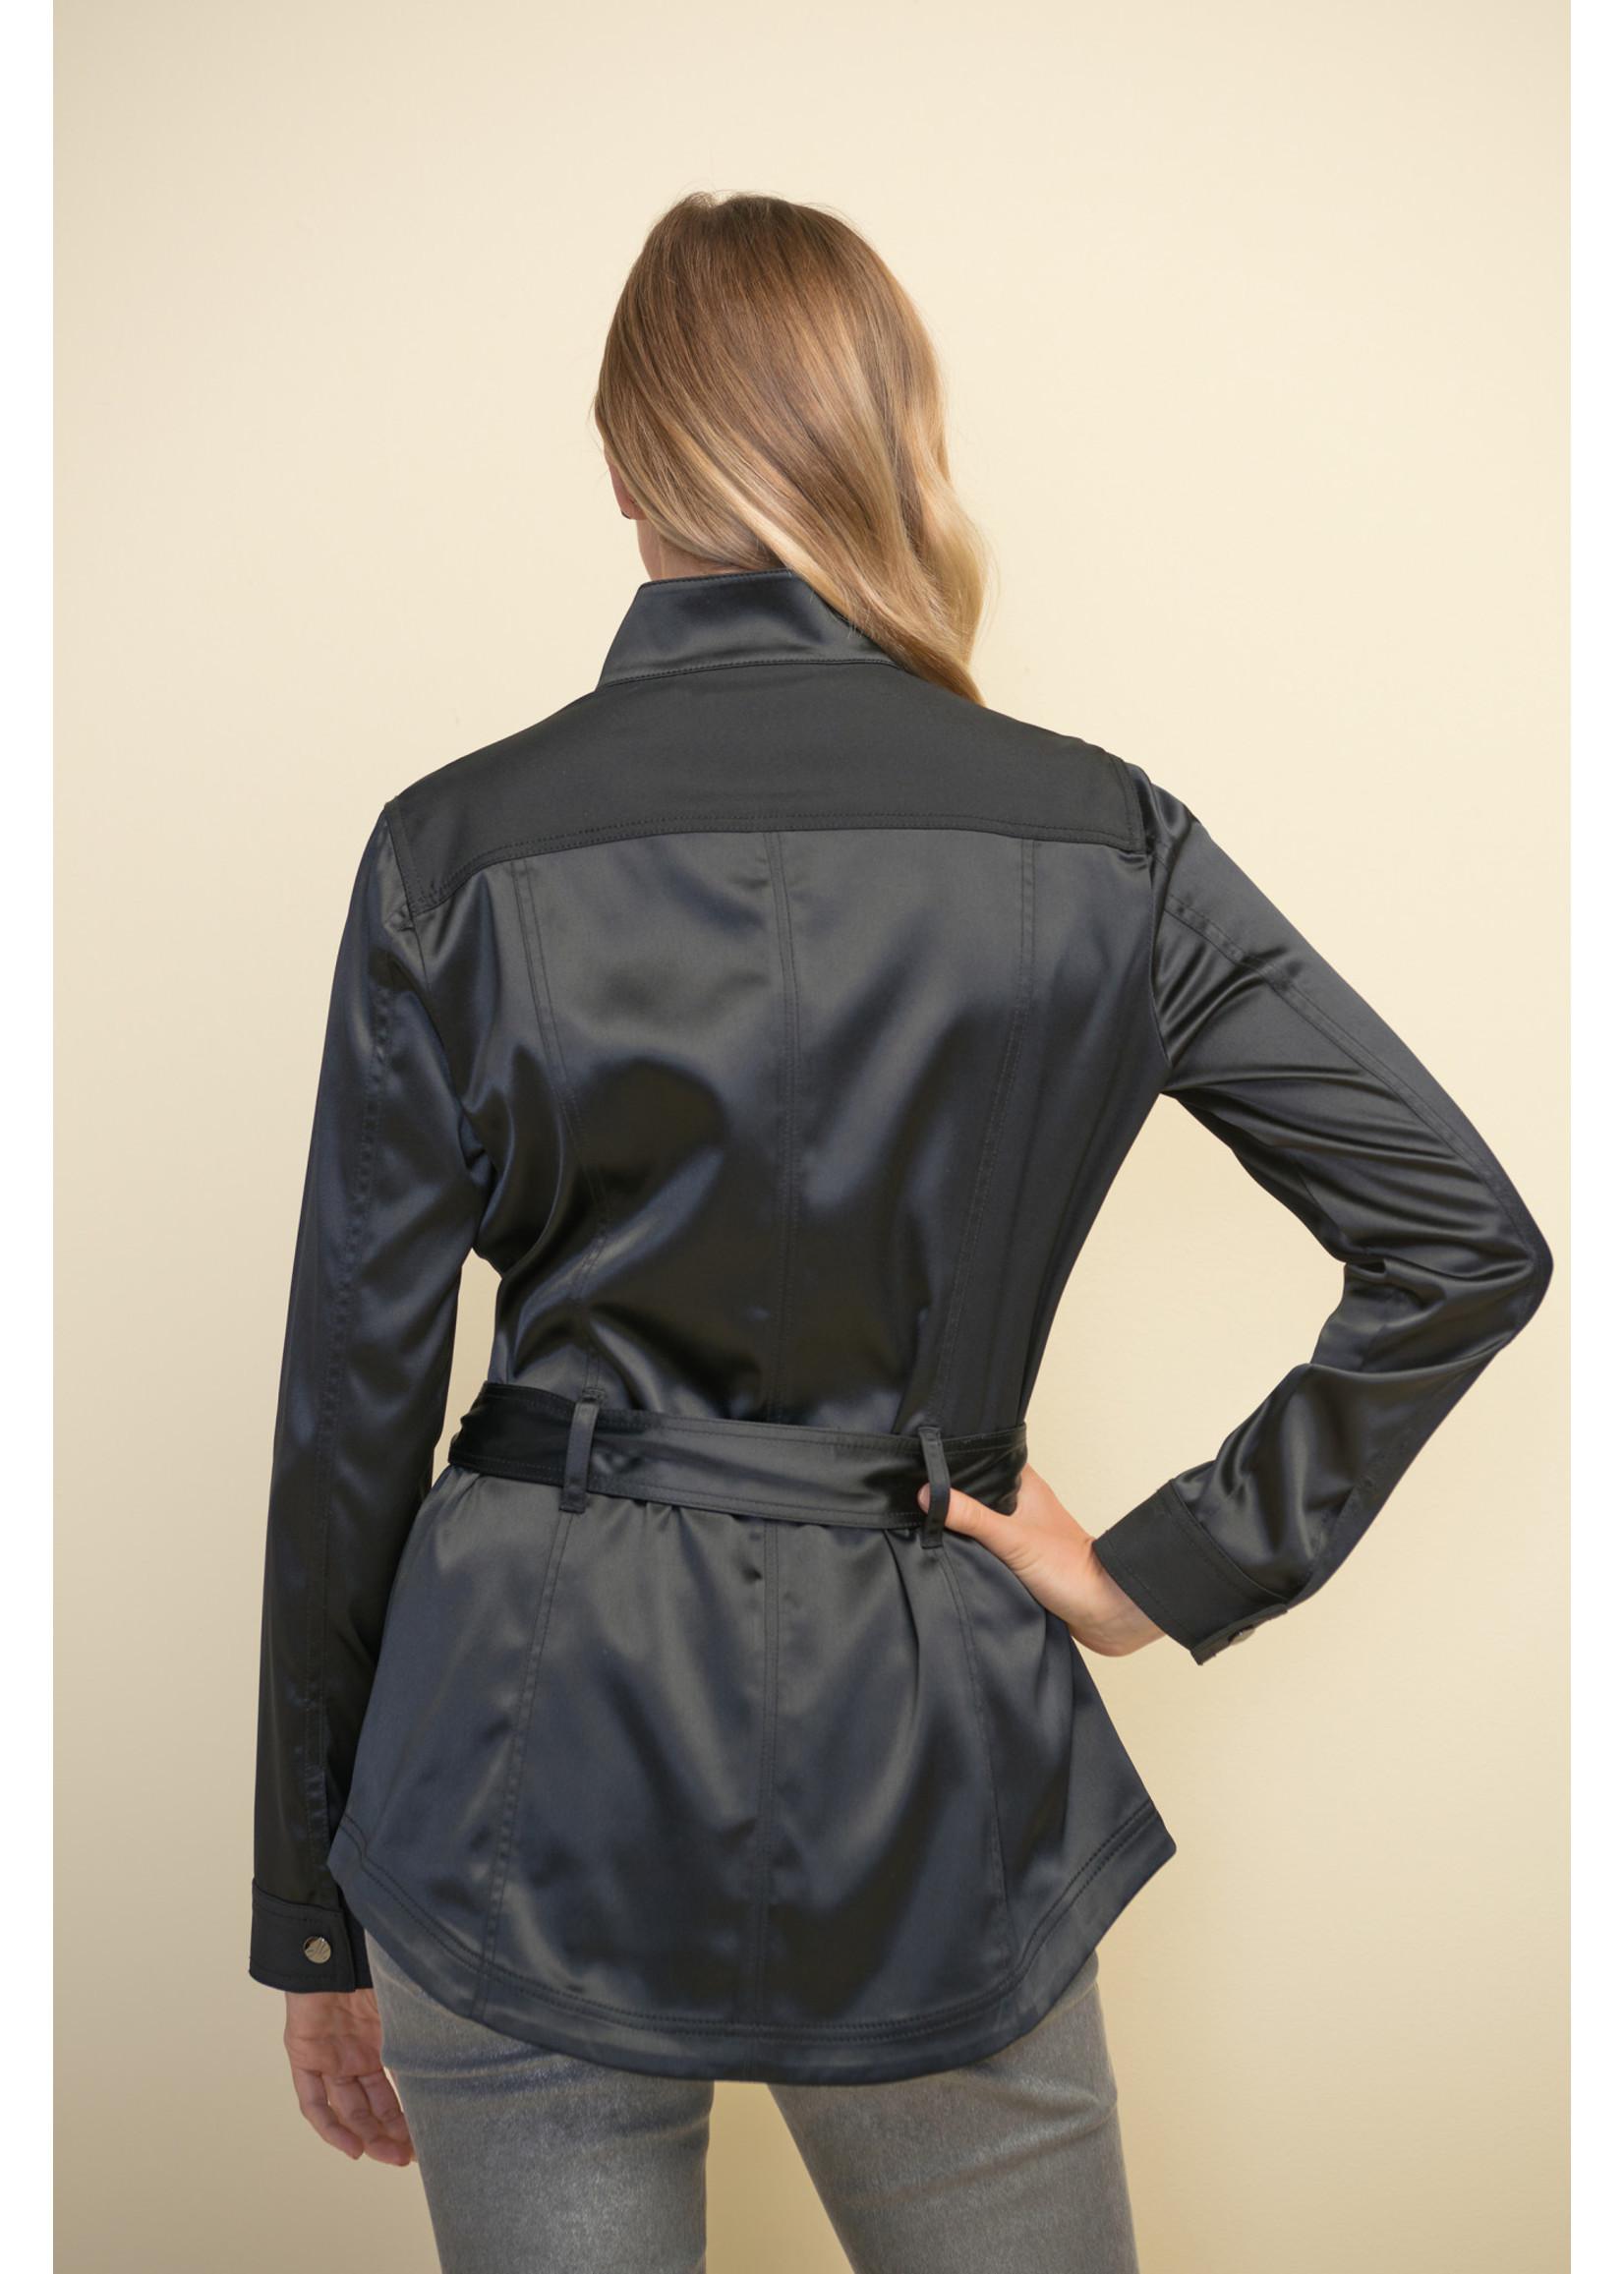 Joseph Ribkoff Black Jacket